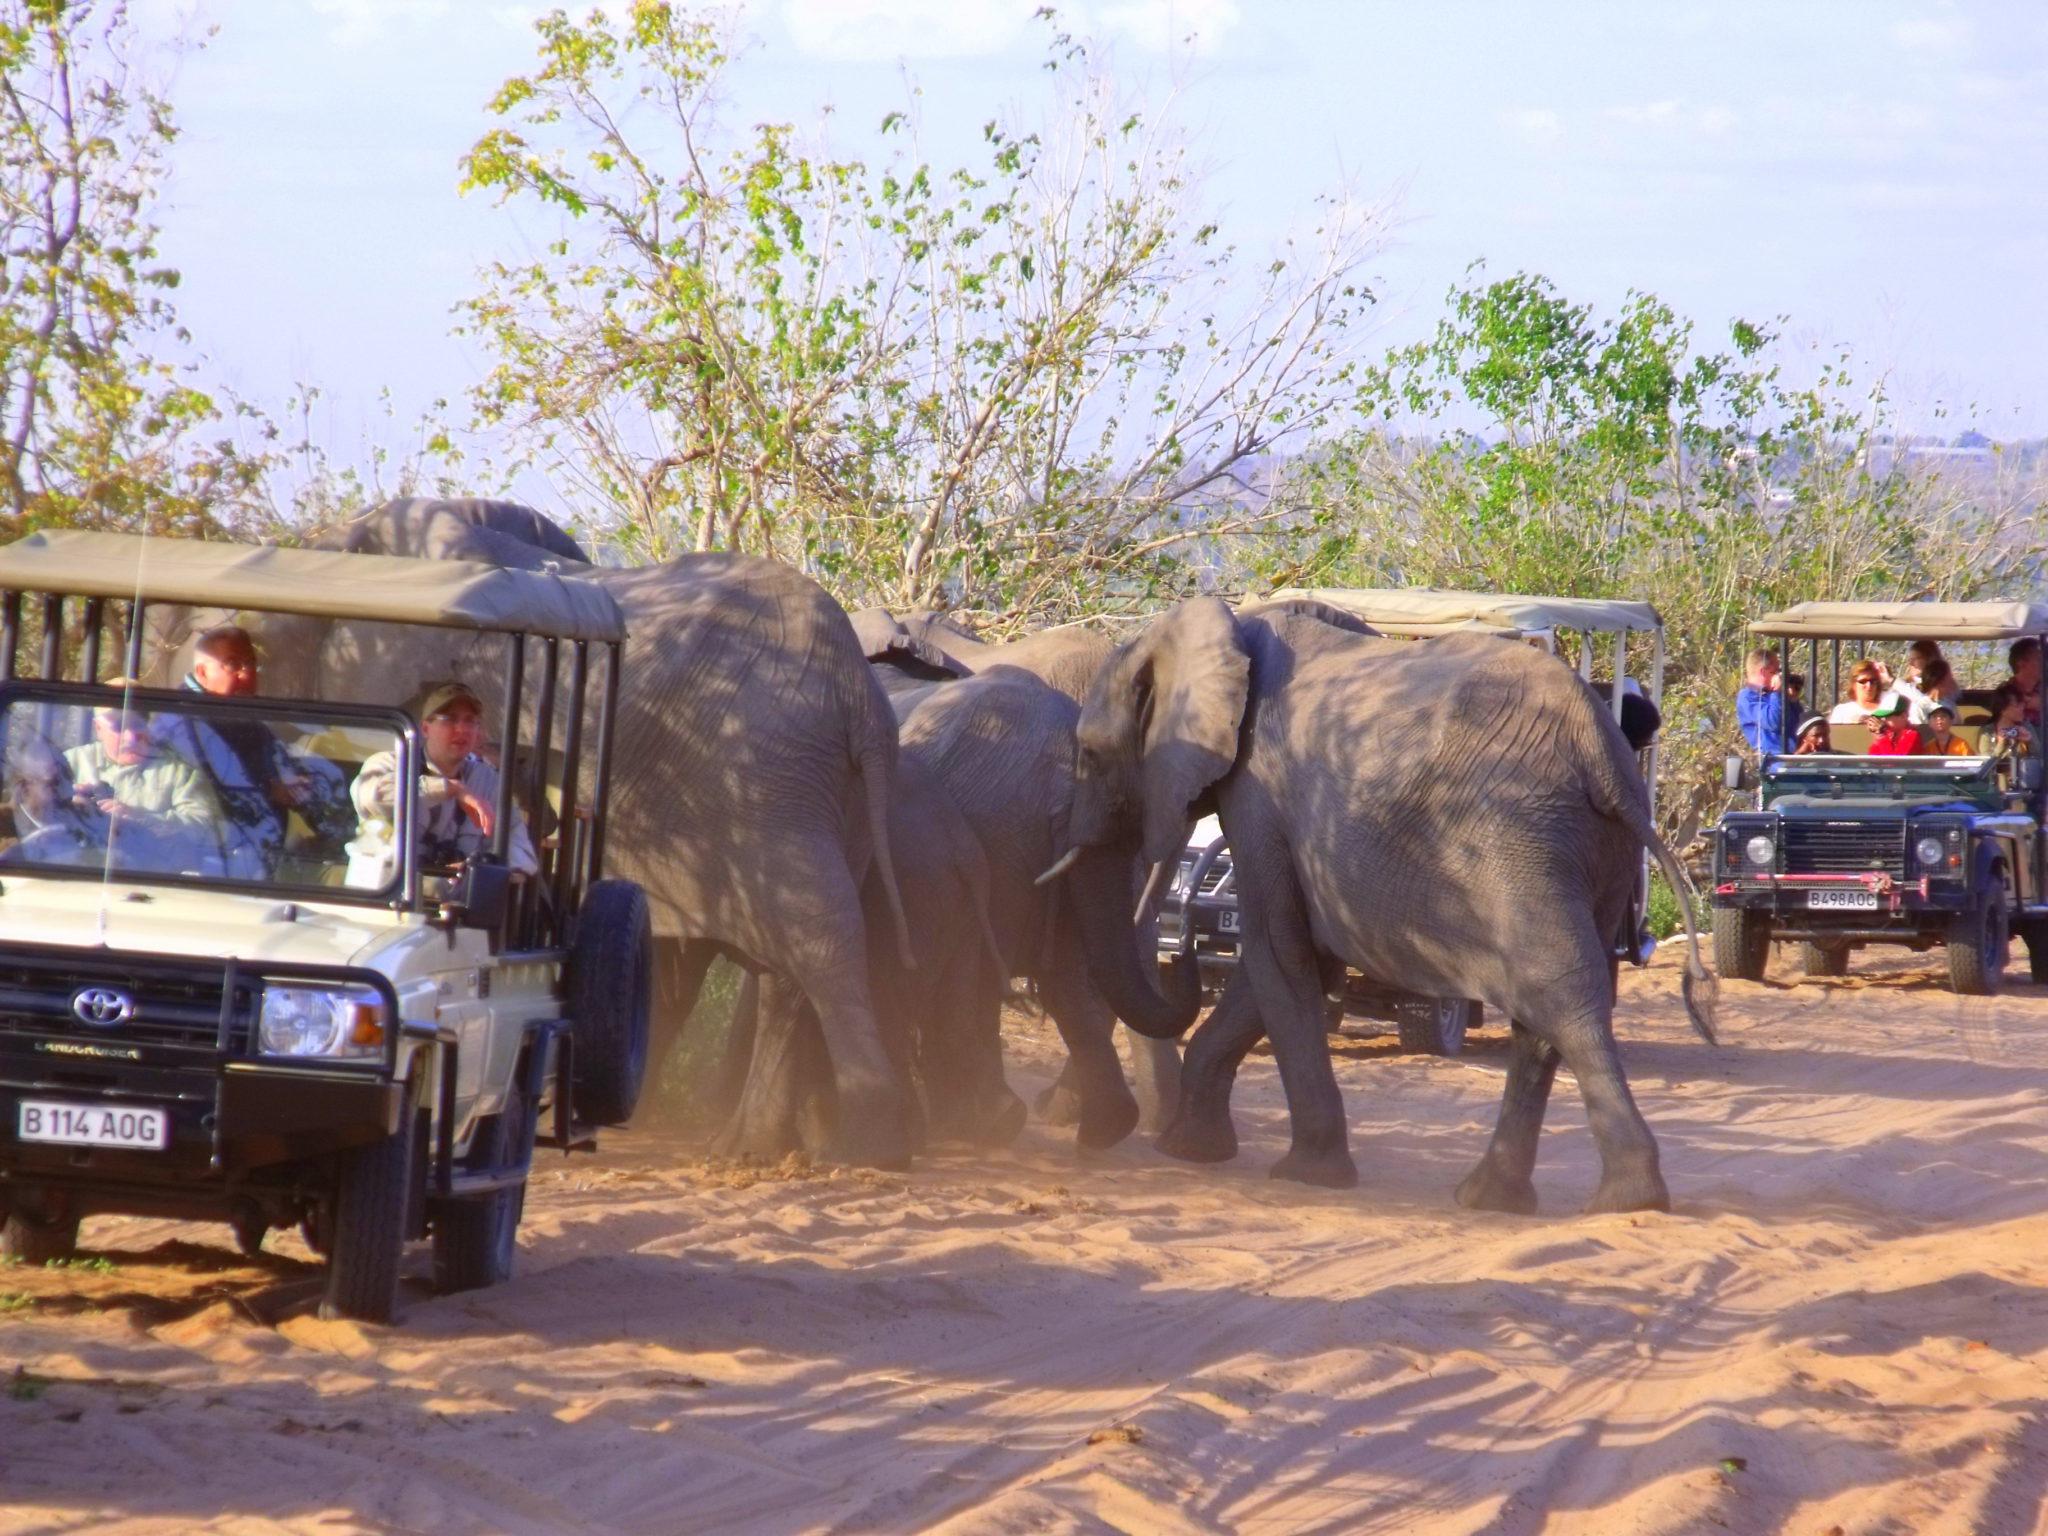 Elephants - Caprivi